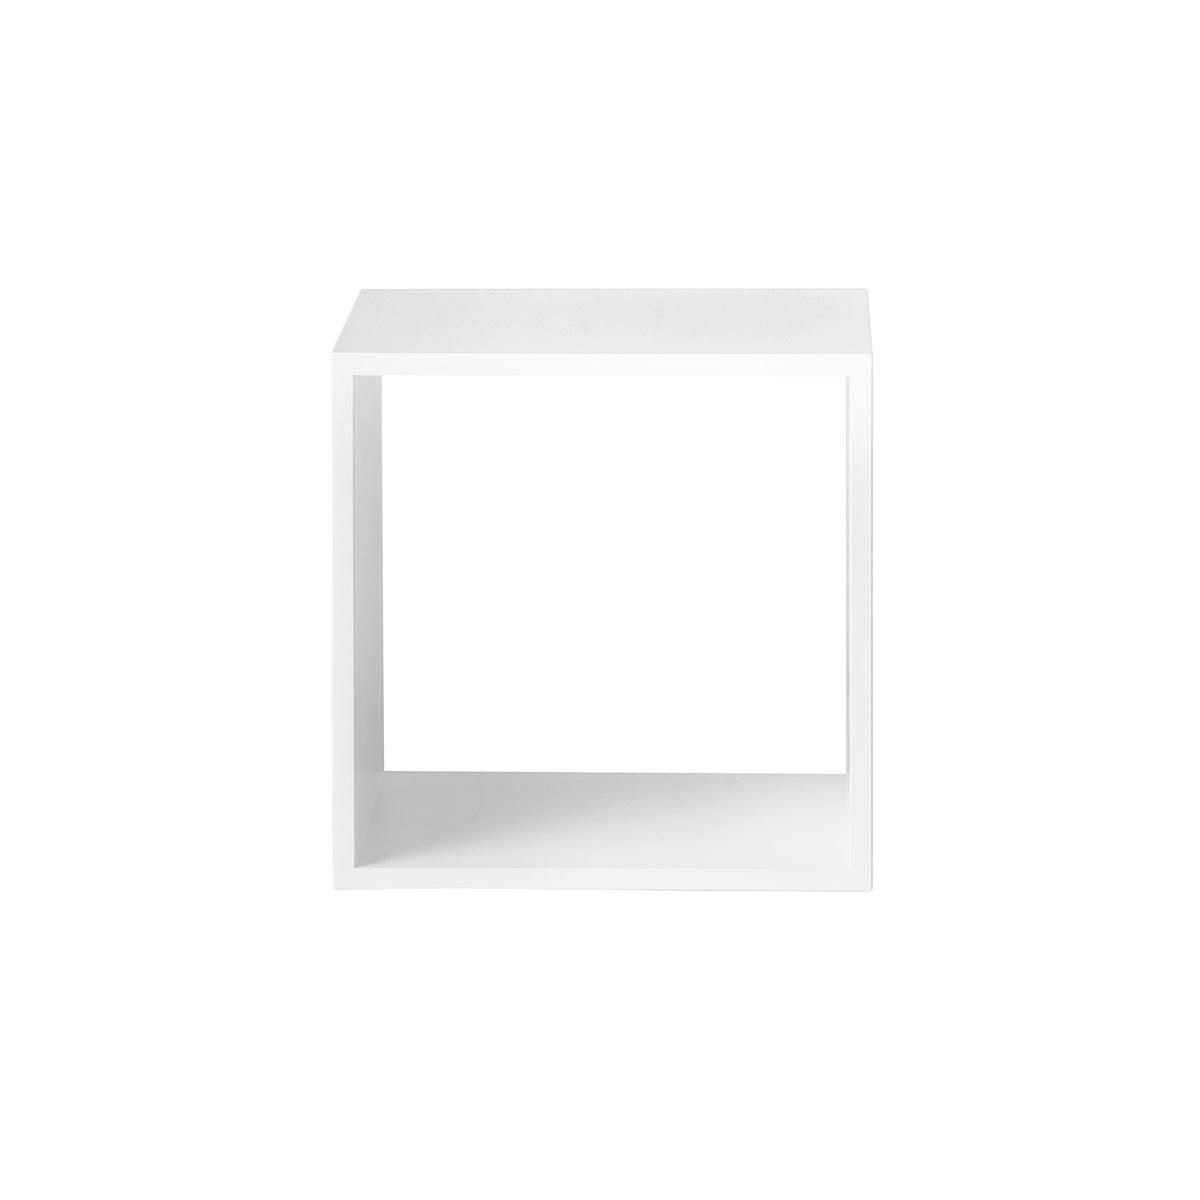 /Étag/ère Cube M Blanc Muuto Sans Fond Stacked